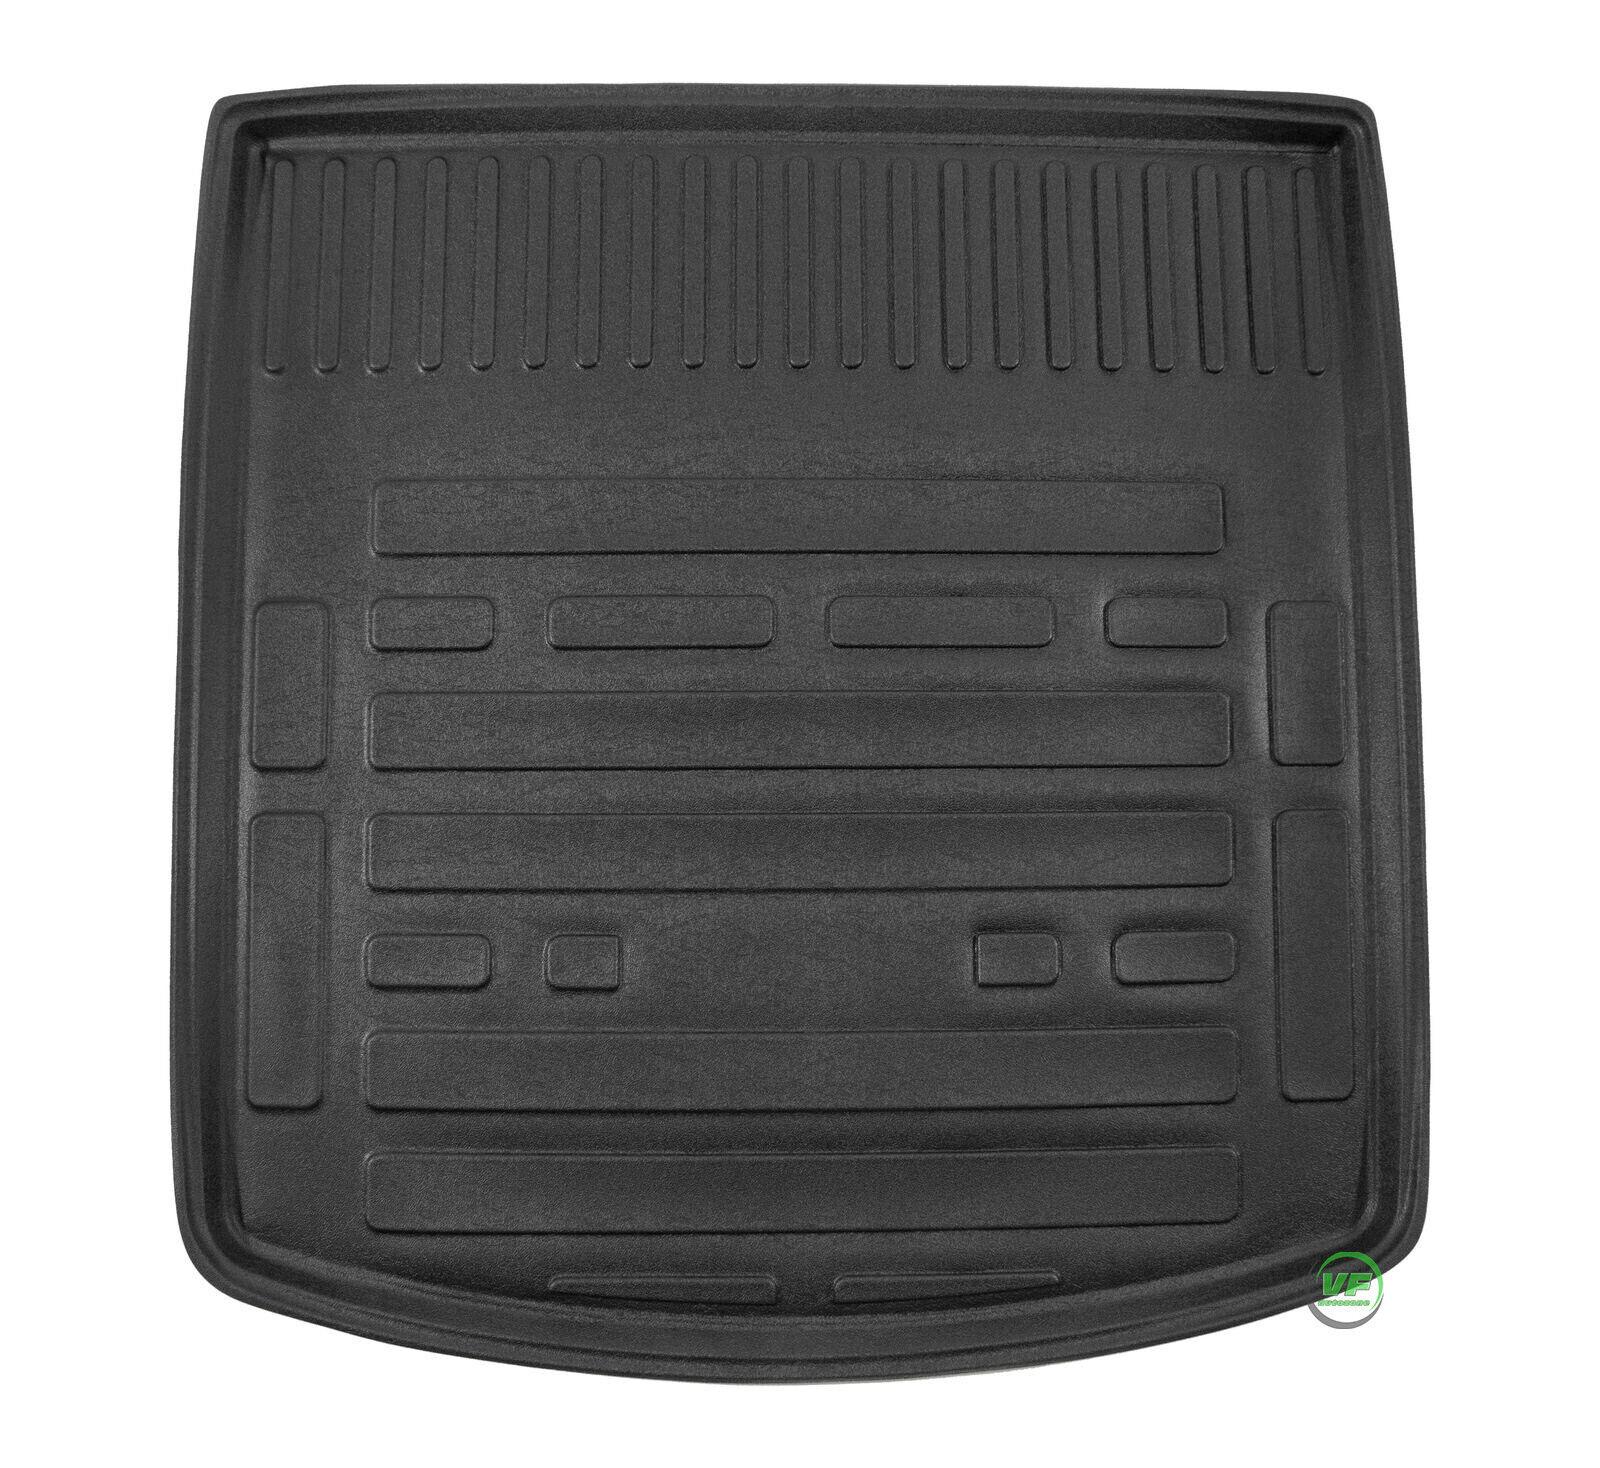 2015 Mack TERRA PRO CABOVER High corner mount spotlight 100W Halogen Driver side WITH install kit 6 inch -Black